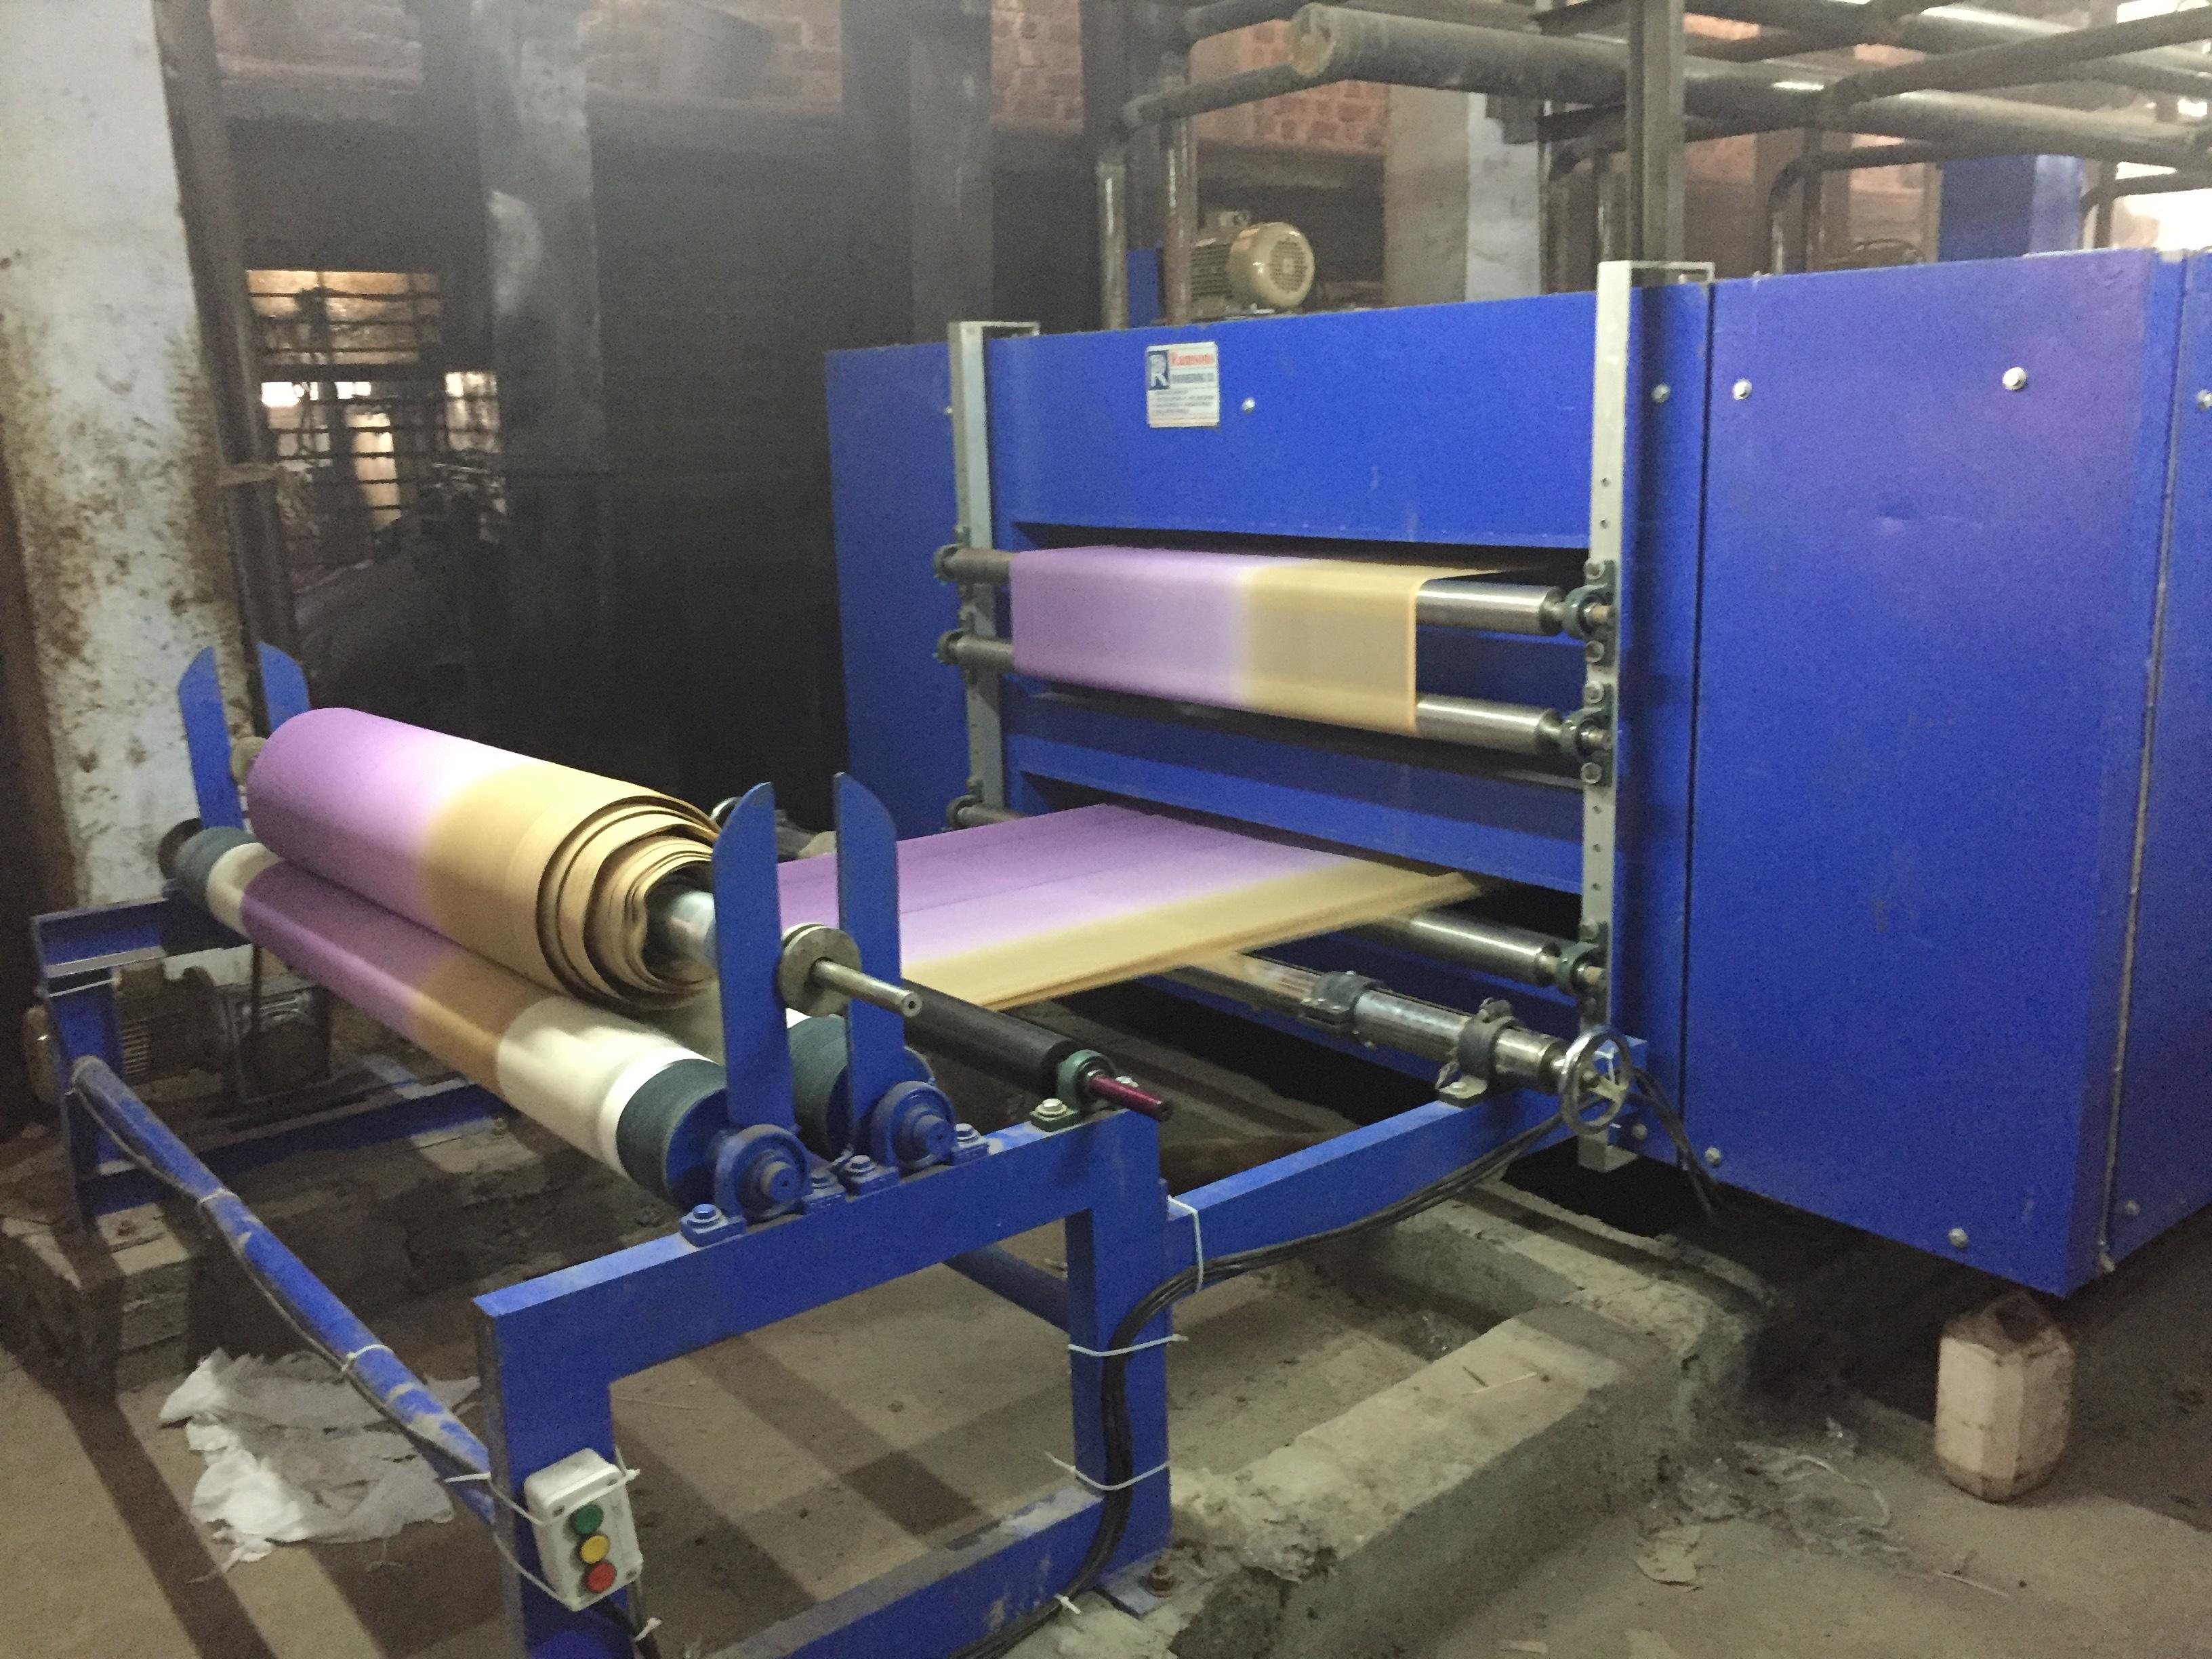 Shaded Dyeing Machine